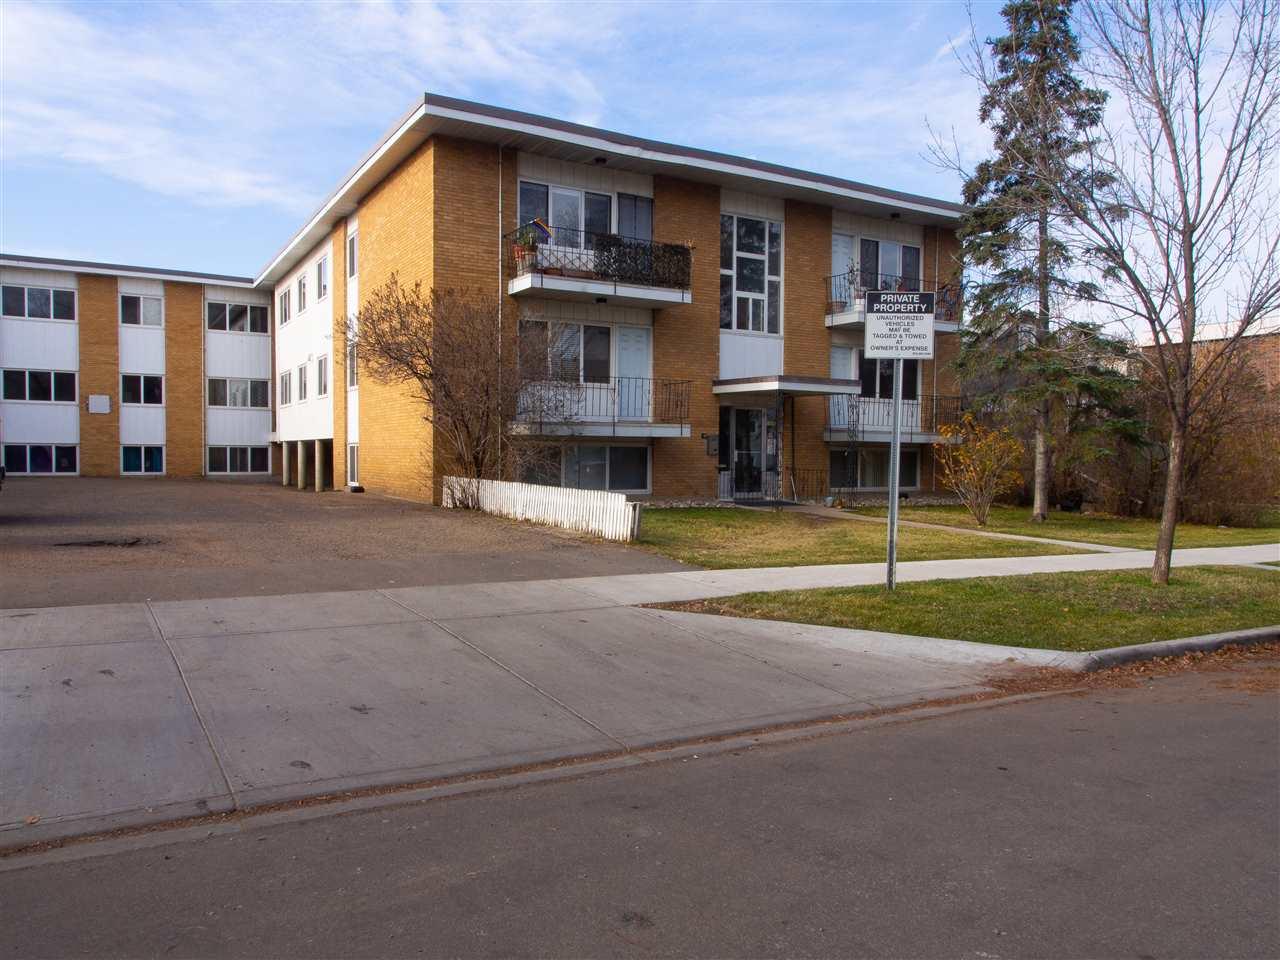 Buliding: 10620 114 Street, Edmonton, AB